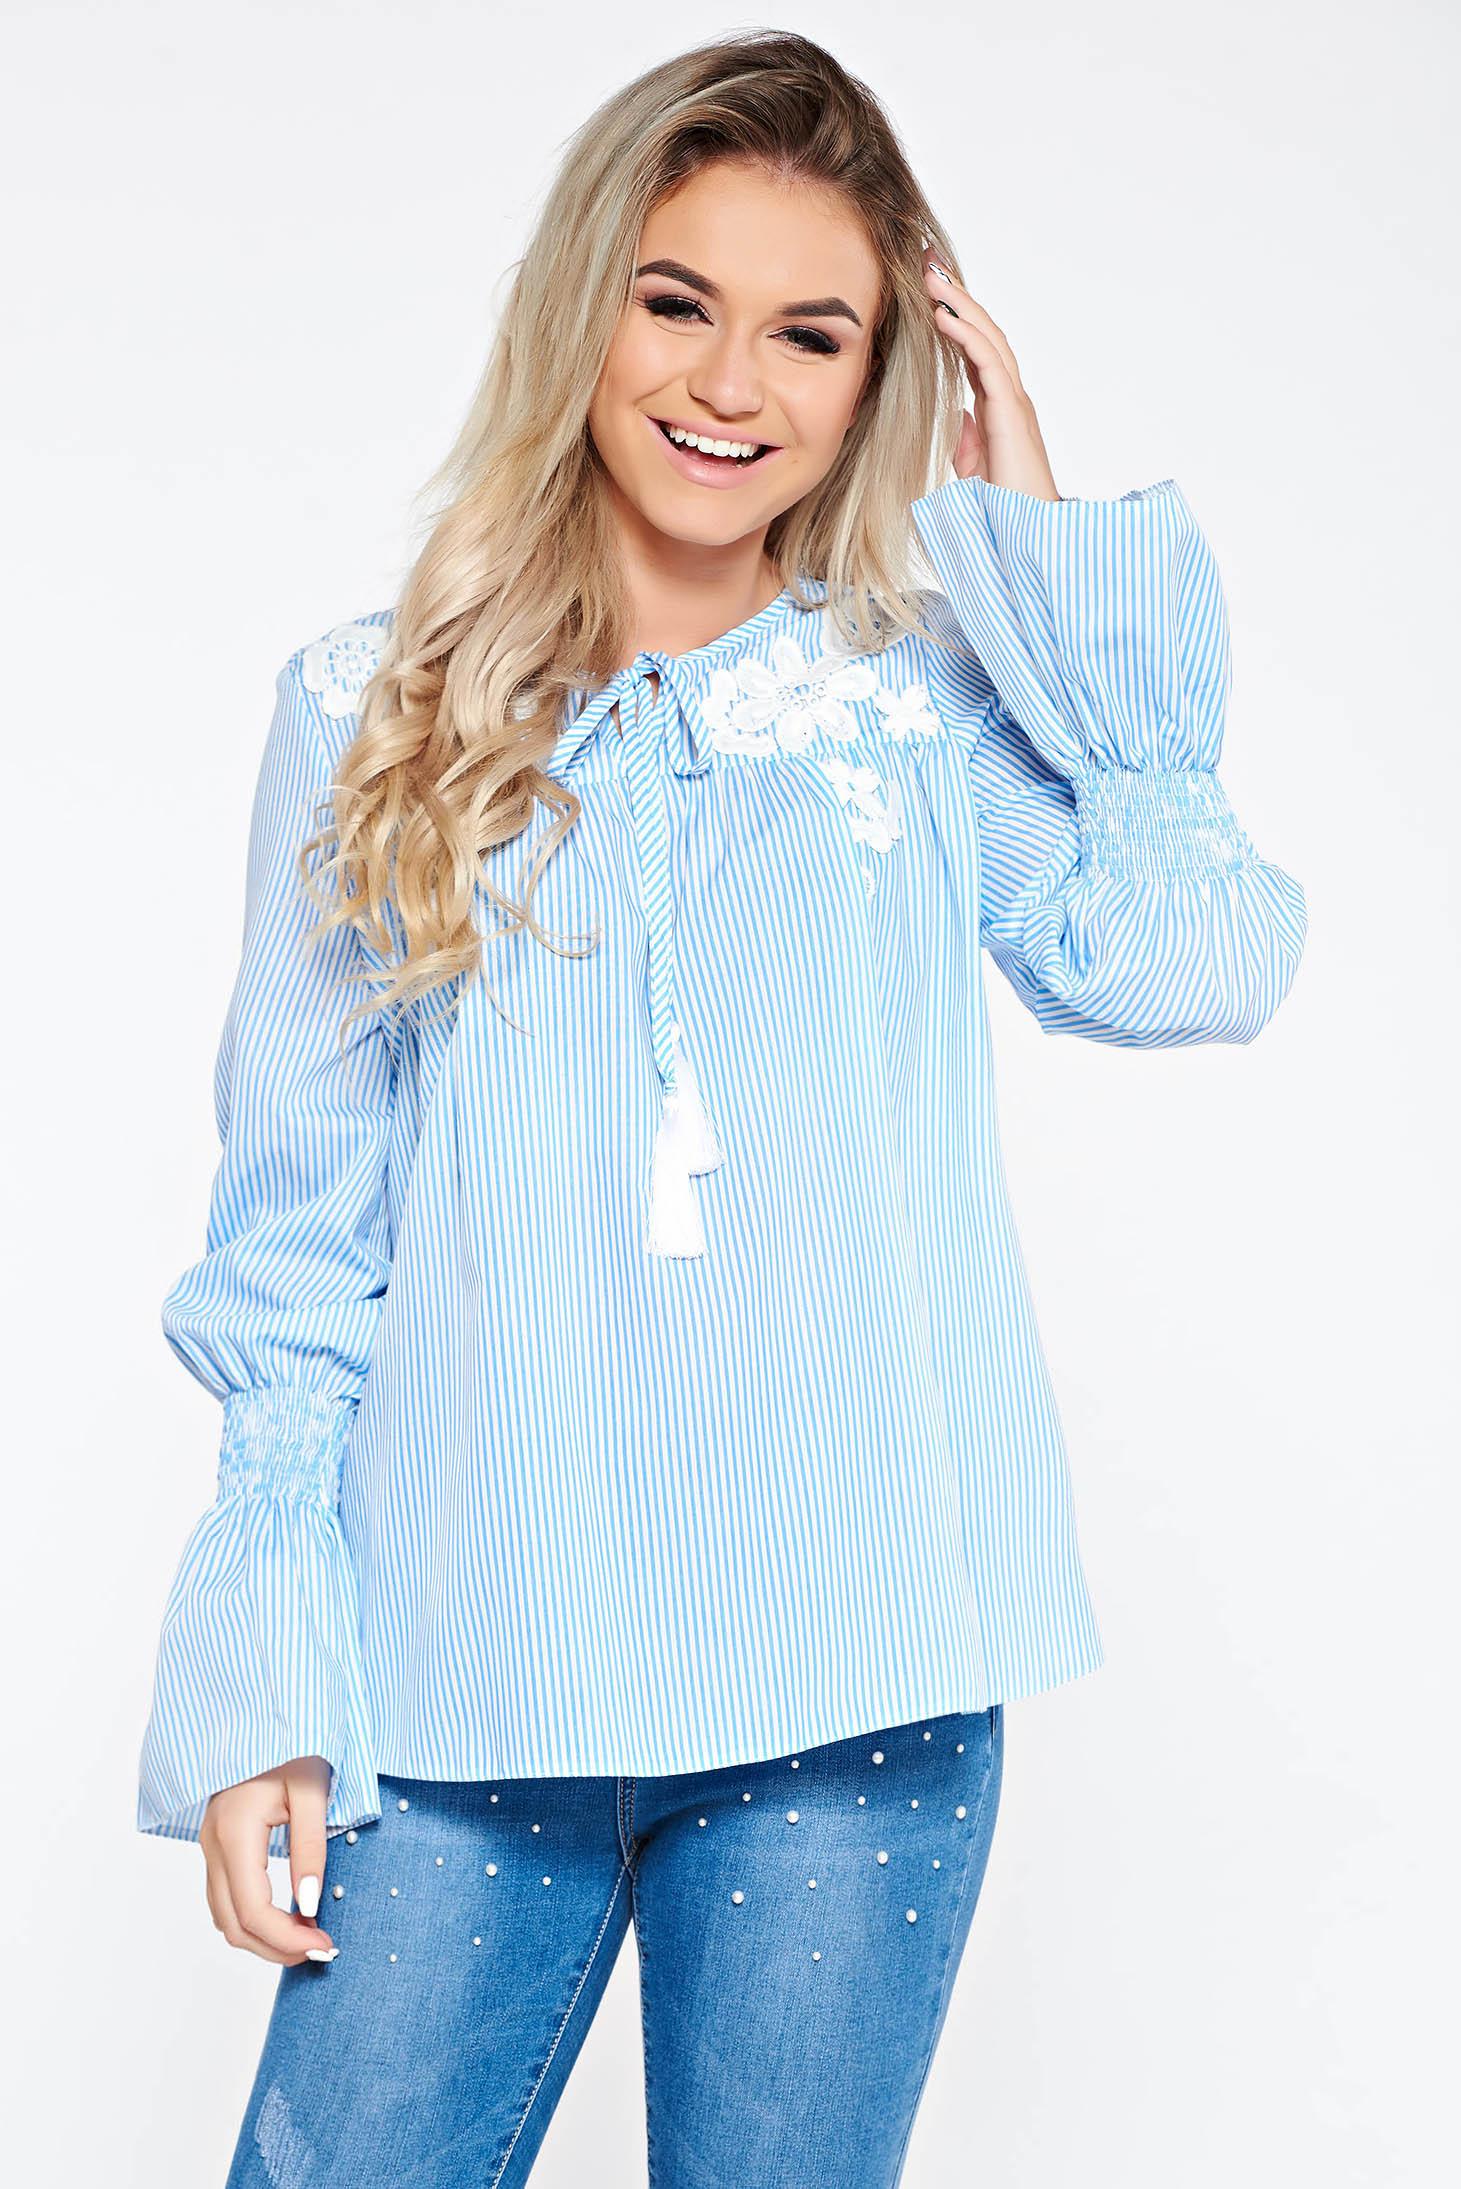 Bluza dama LaDonna albastra-deschis casual brodata cu croi larg din bumbac neelastic cu maneci clopot